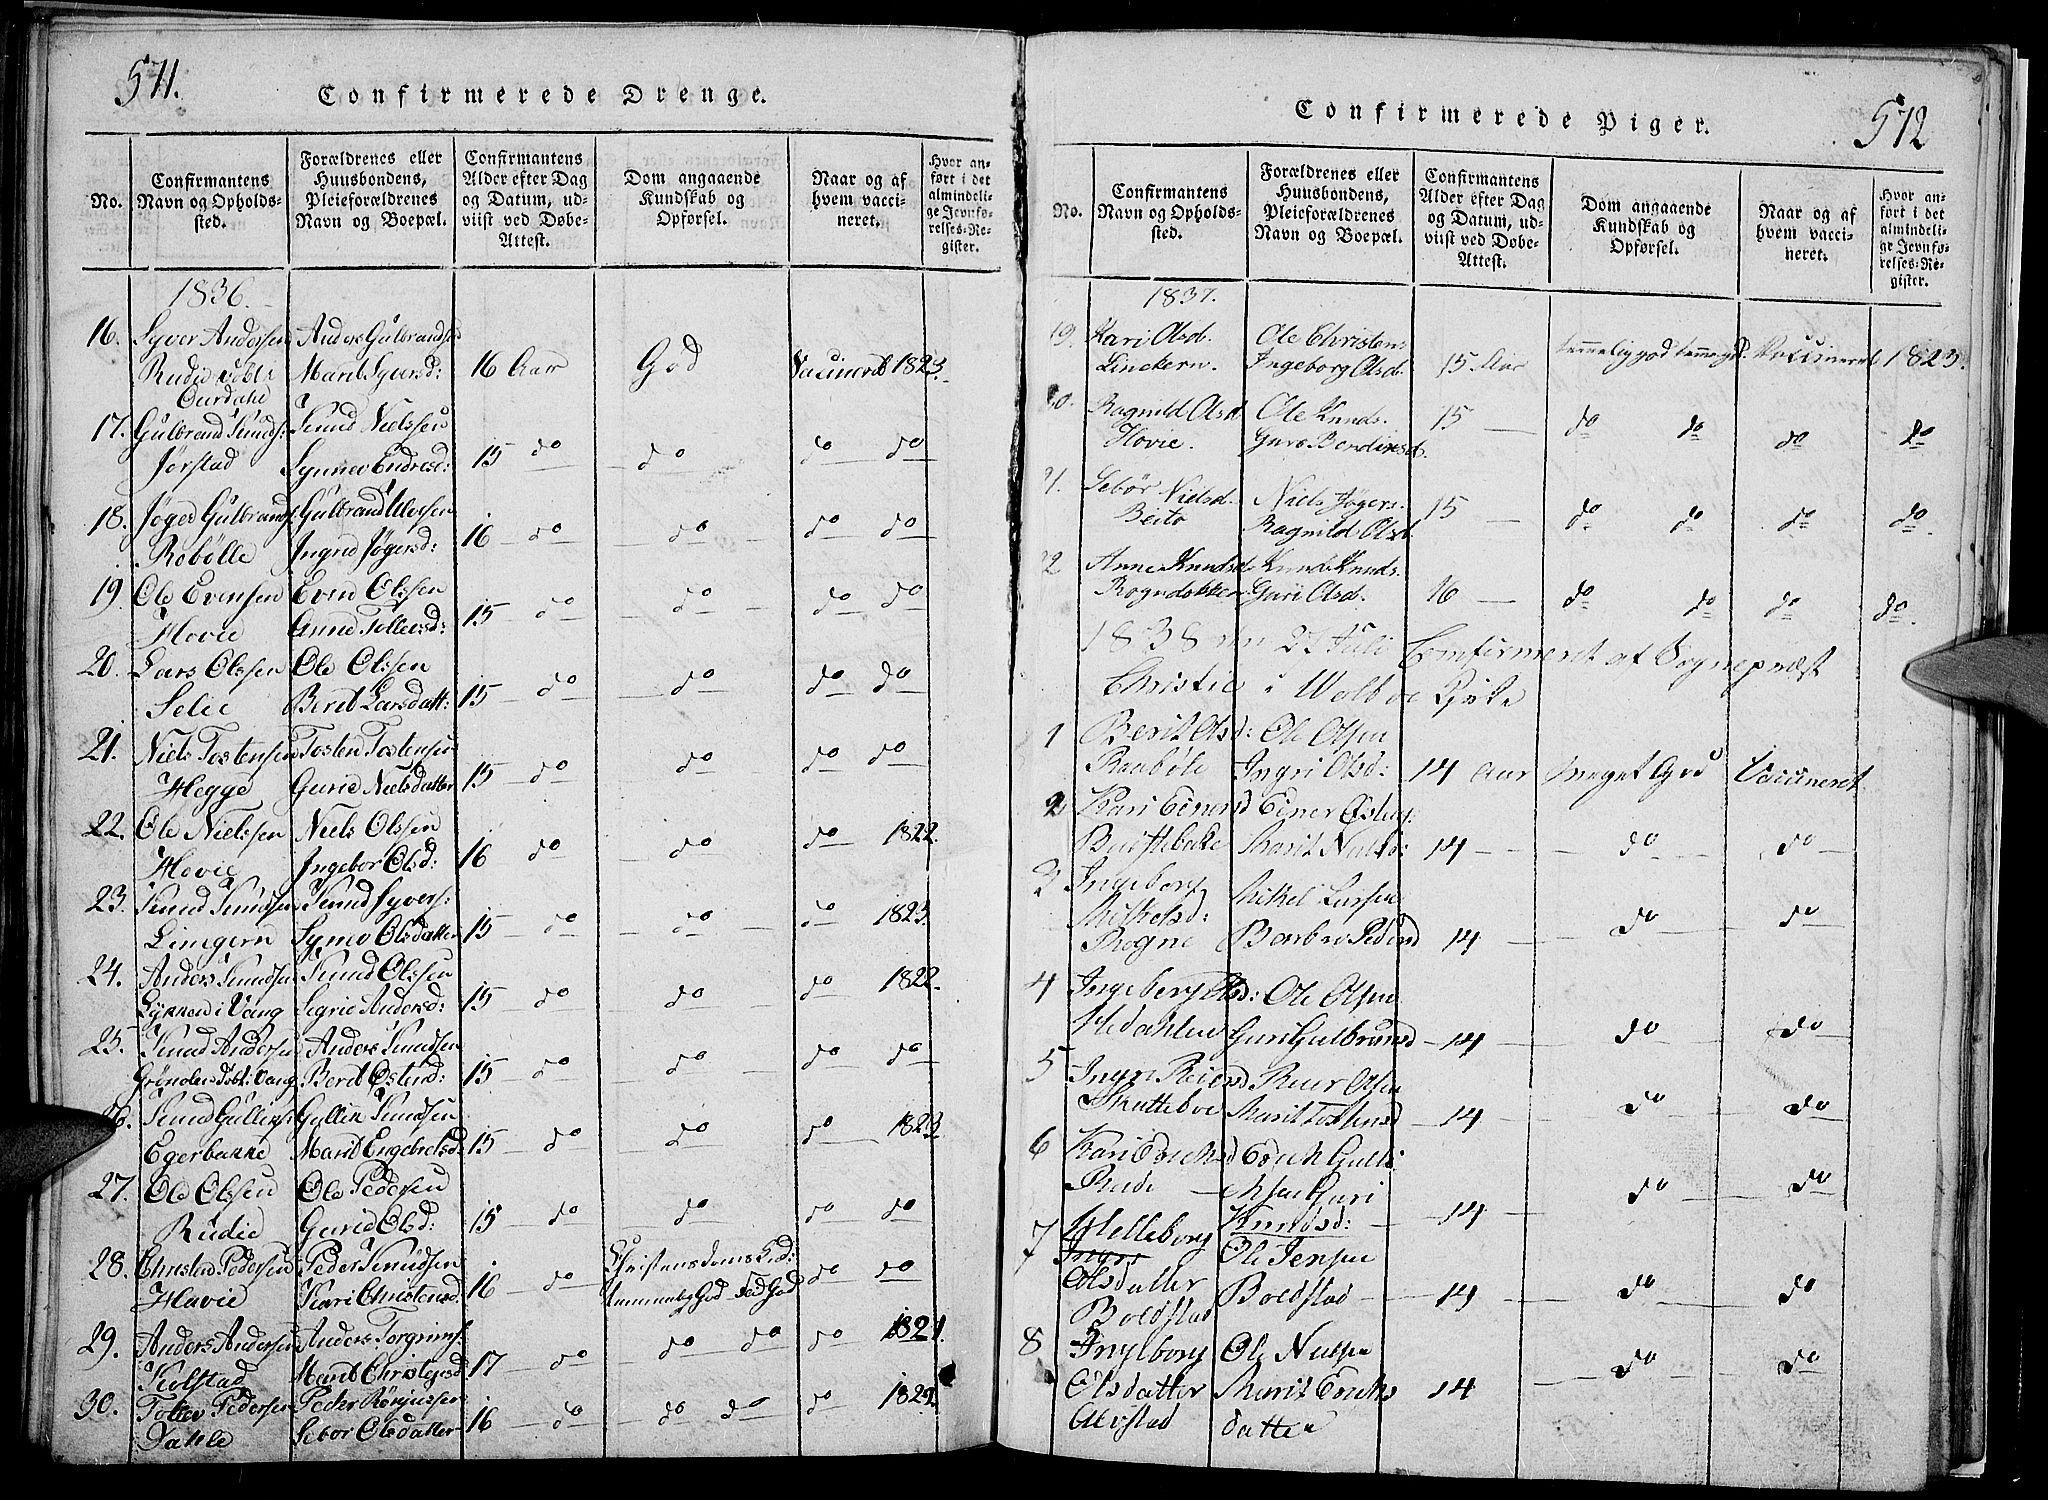 SAH, Slidre prestekontor, Klokkerbok nr. 2, 1814-1839, s. 571-572